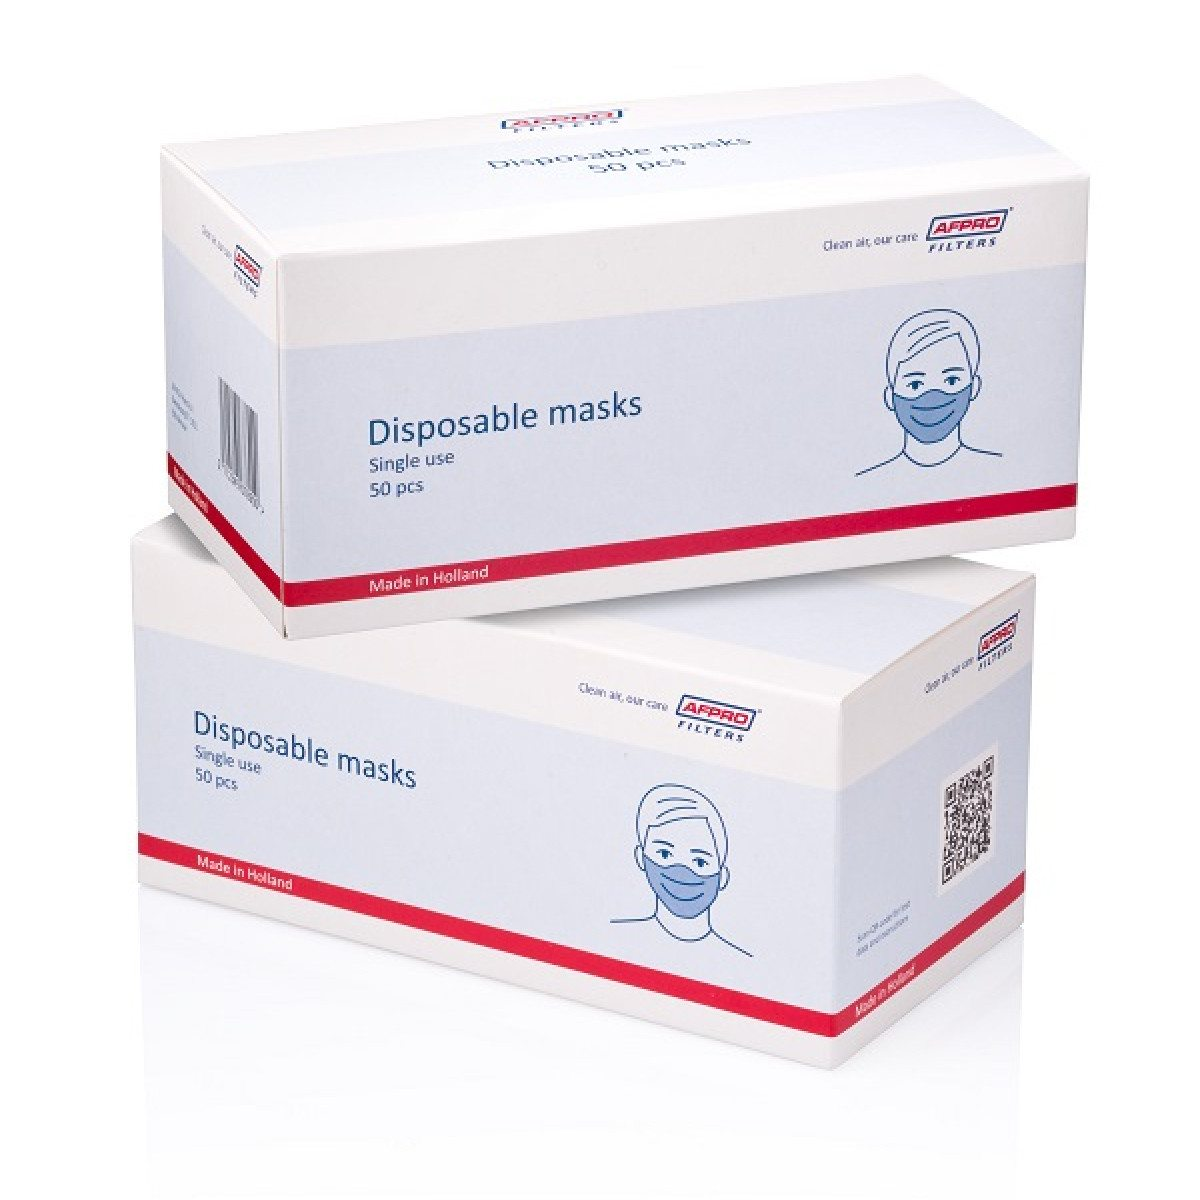 afpro-mundmasken-typ-2-kwl-filter-store-50-stueck-3_2